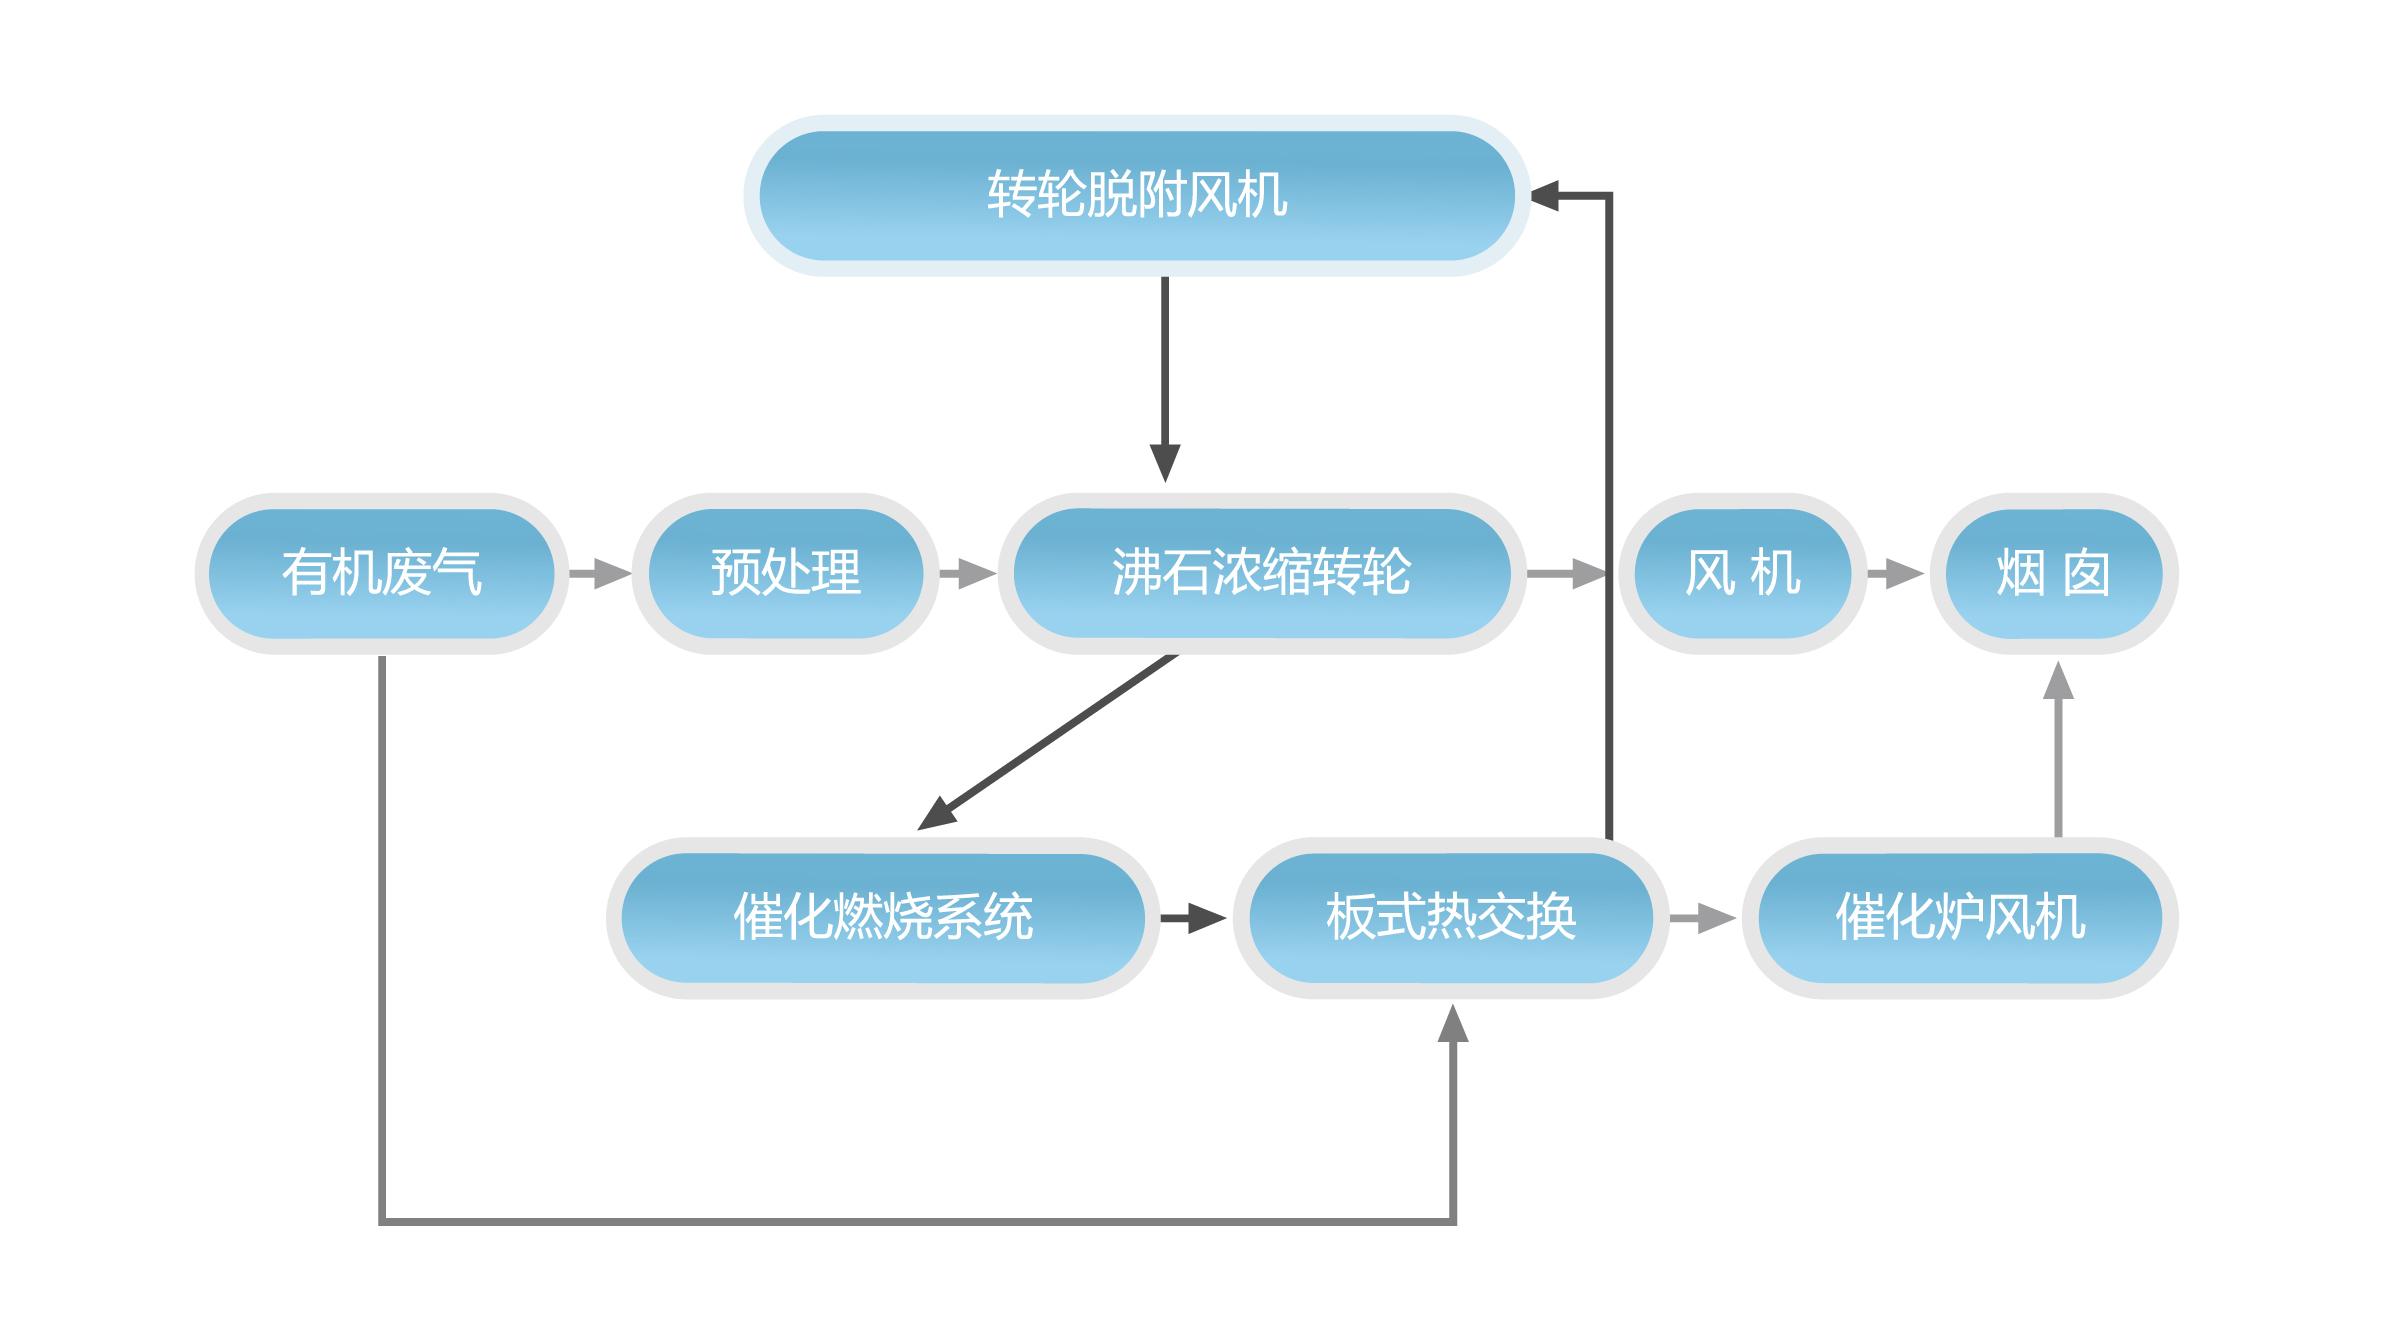 沸石�饪s�D��b置+RCO